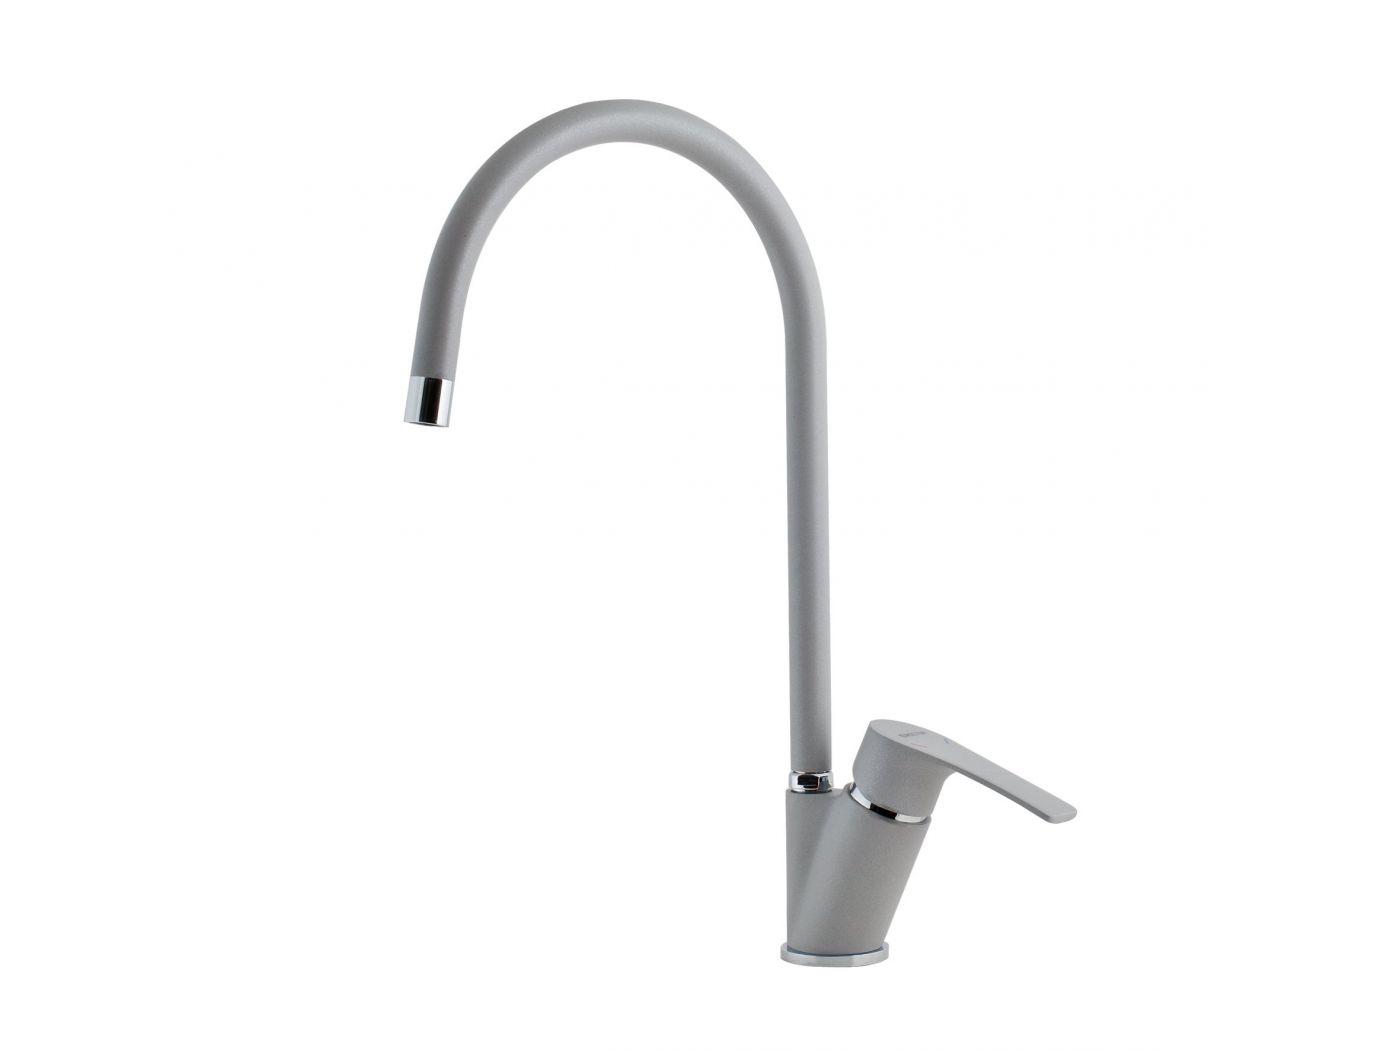 Смеситель для кухни Ewigstein 5023501 Серый металлик